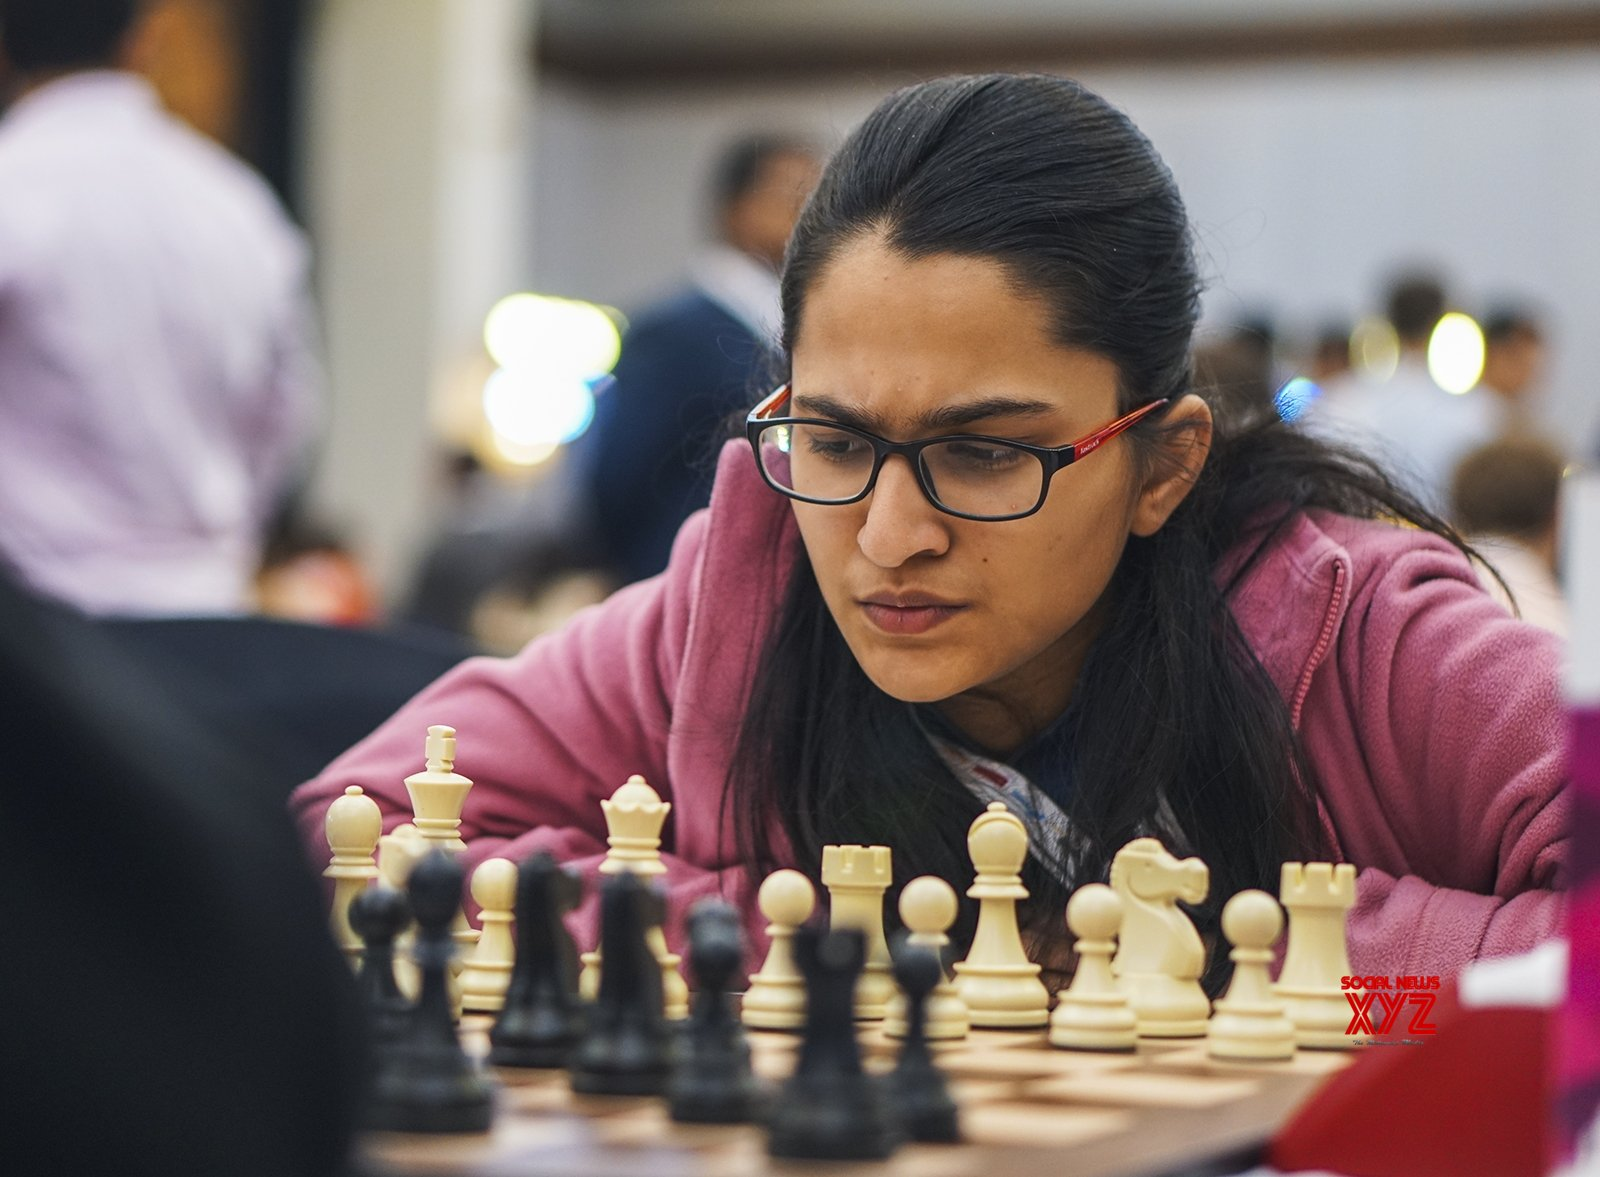 Mumbai: World Youth Chess Championship 2019 - Vantika Agrawal #Gallery